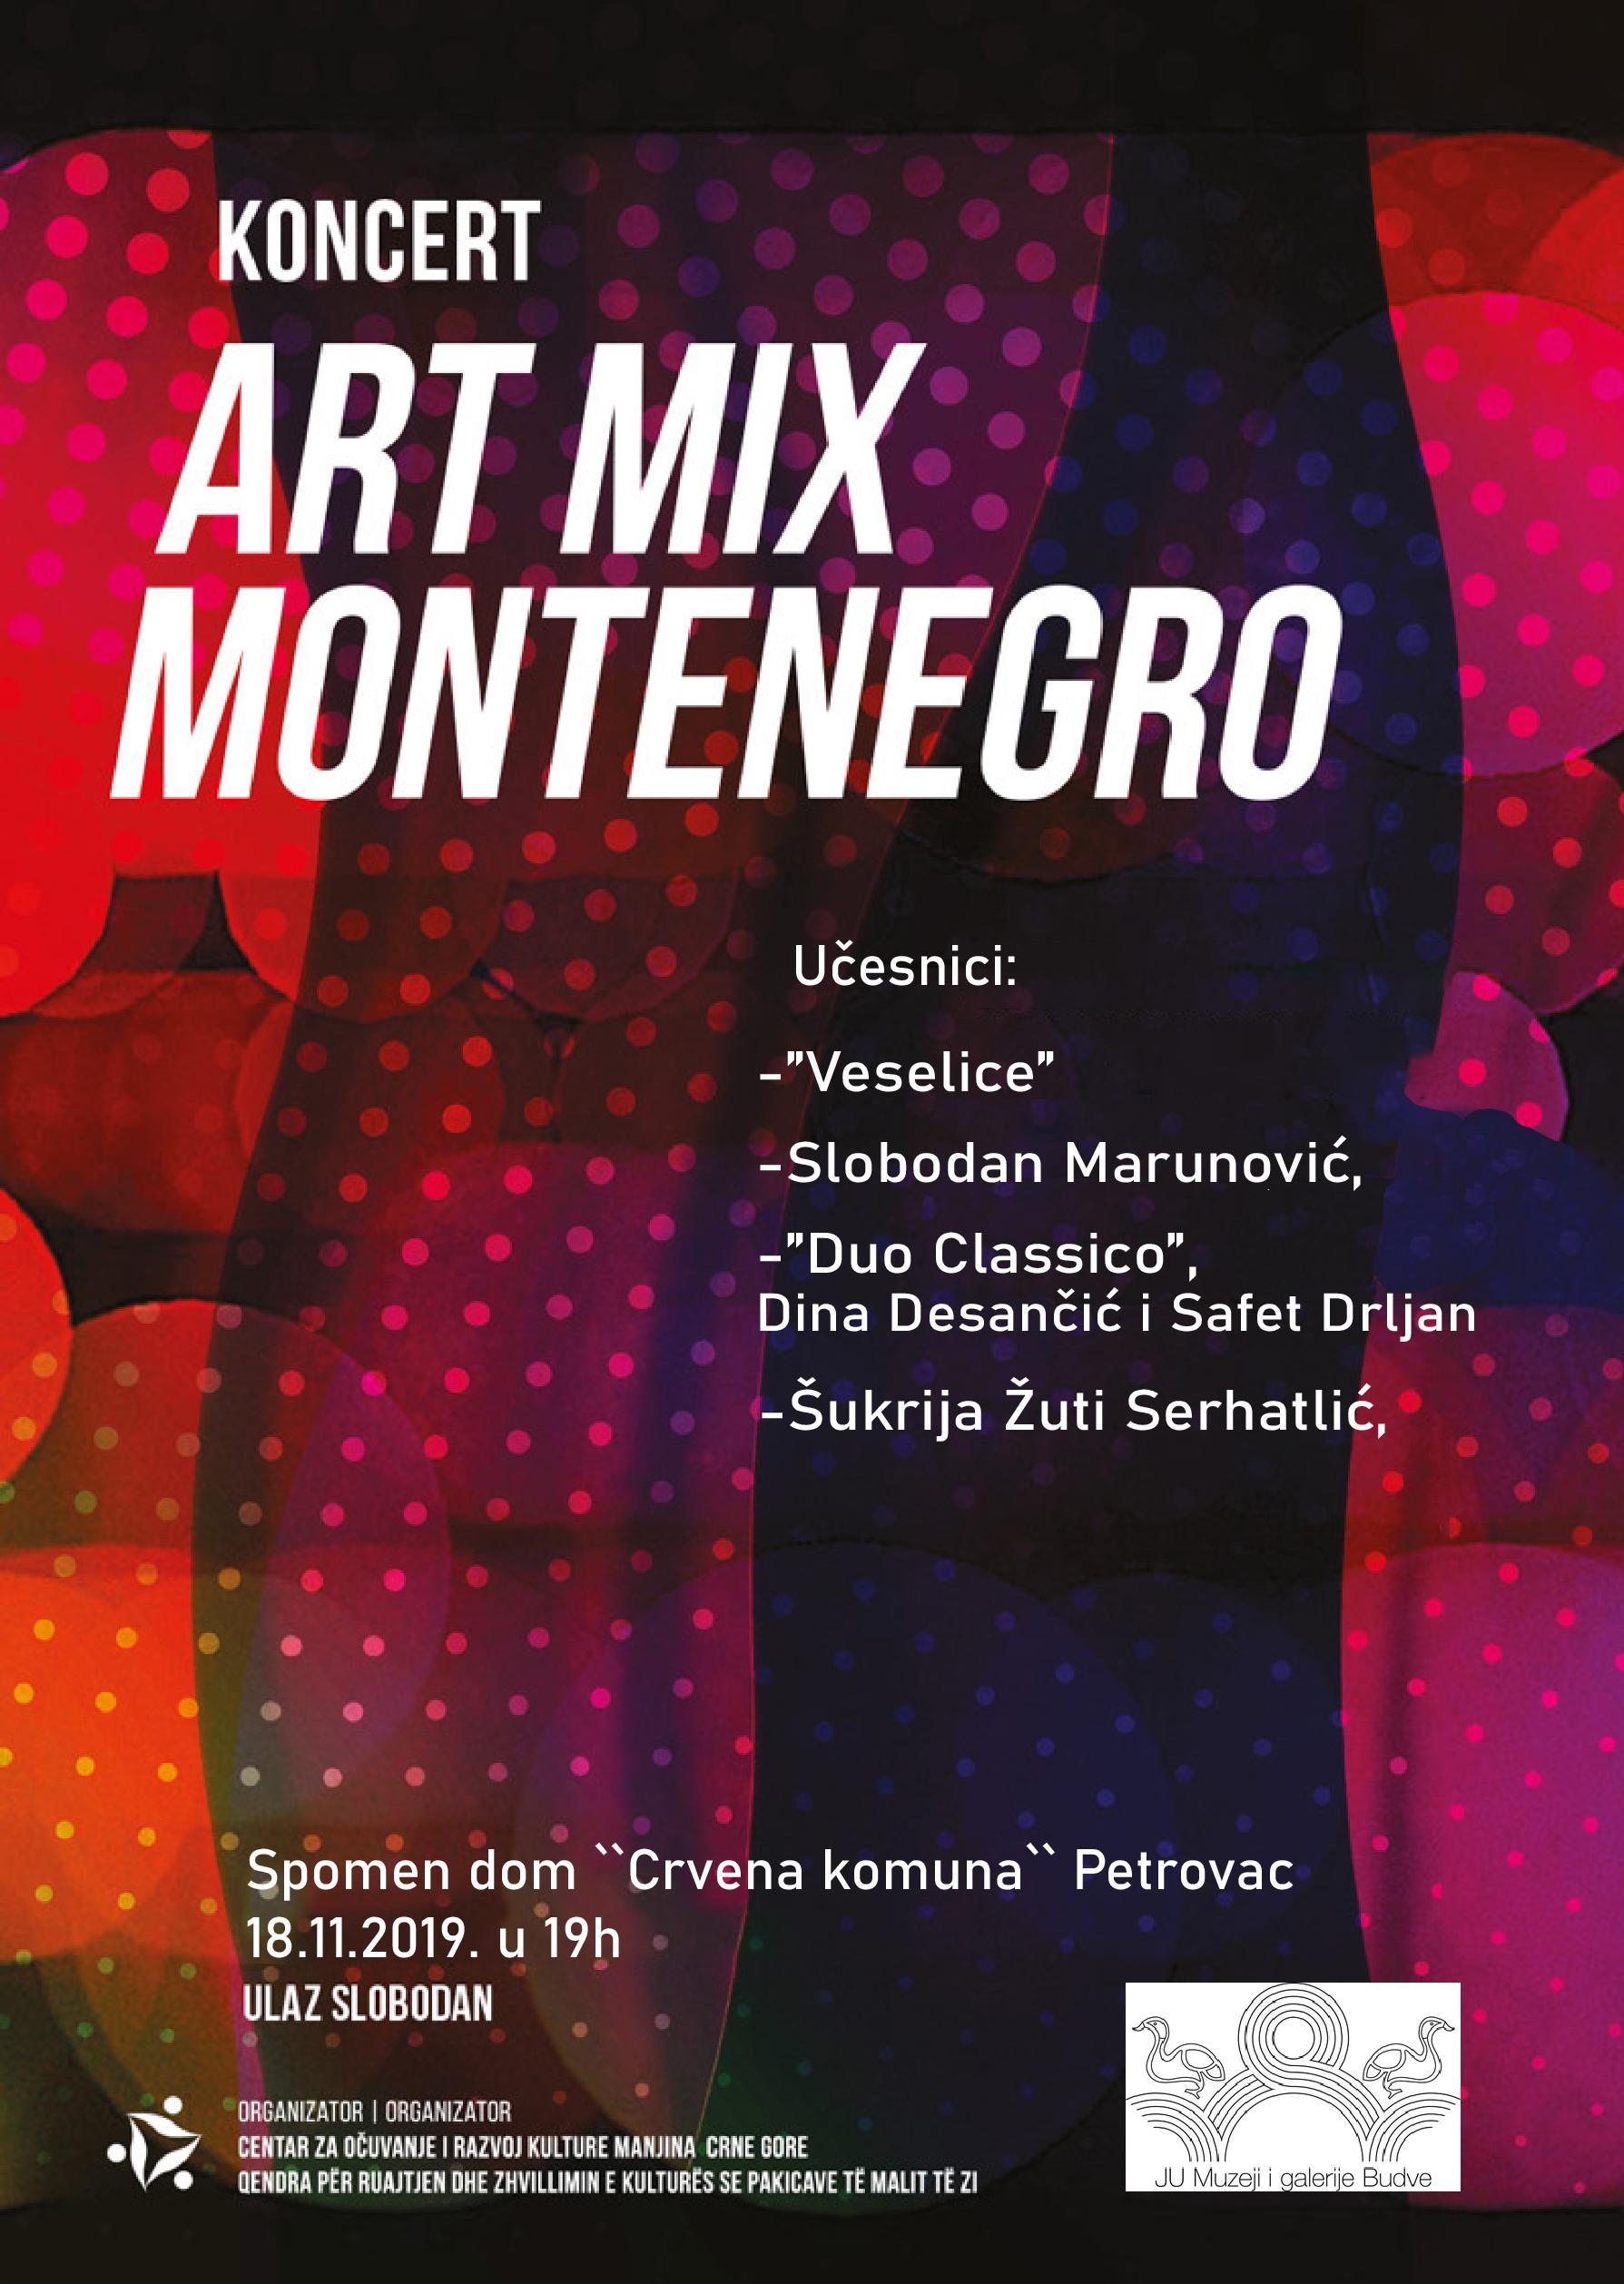 plakat_koncert_art_mix_montenegro_2019_petrovac